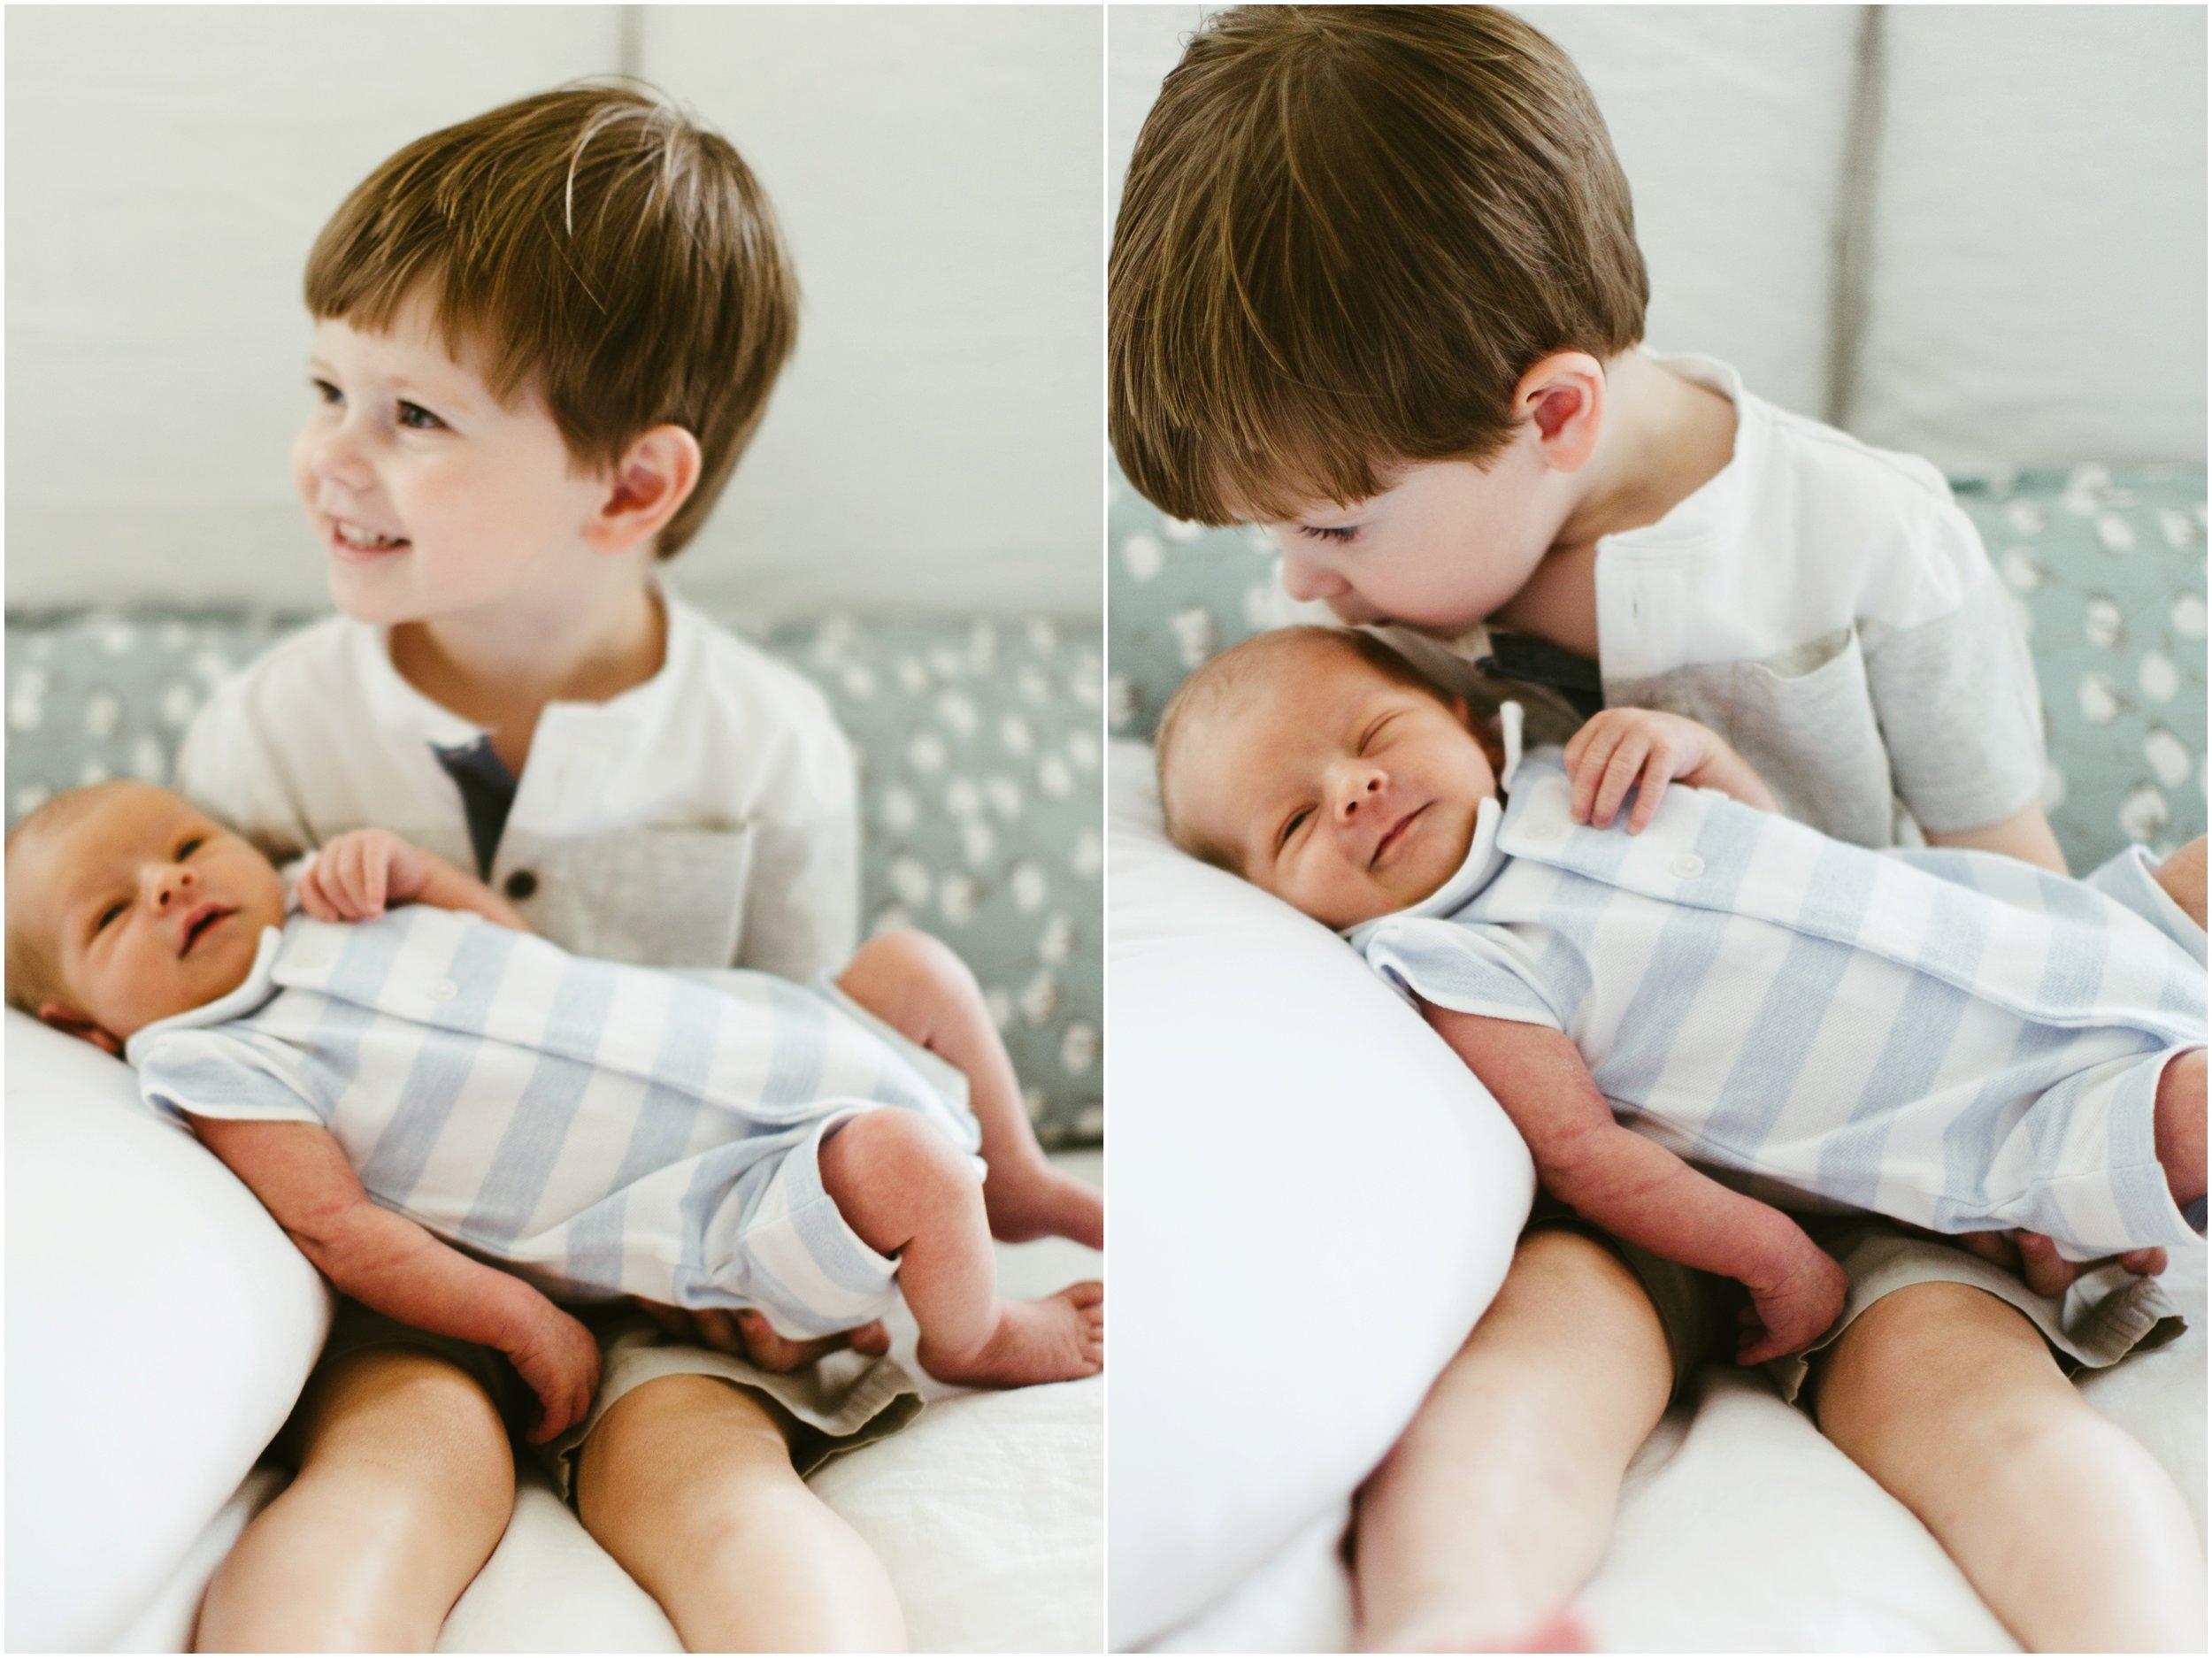 Aldrige-Family-2017-August-034_quaint-and-whim-lifestyle-newborn-photographer-louisiana-aldrige-family-.jpg